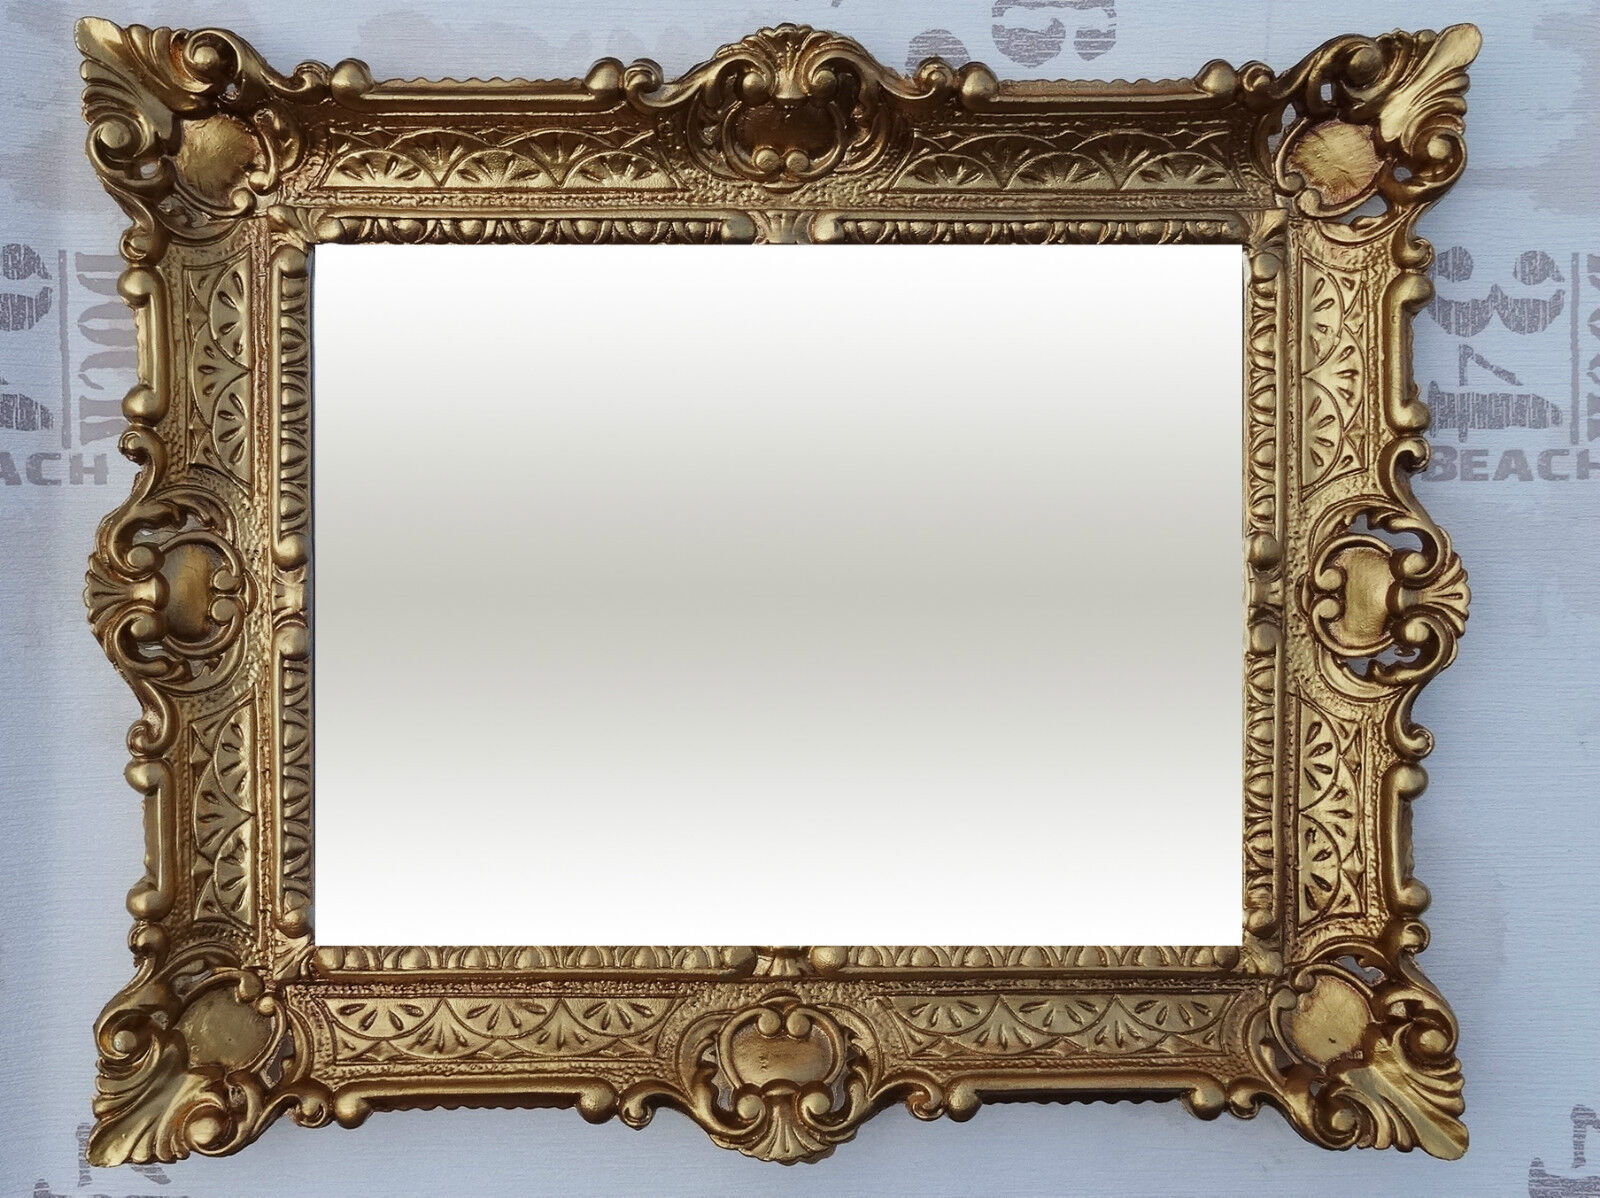 antik barock bilderrahmen gold 56x46 rechteckig repro. Black Bedroom Furniture Sets. Home Design Ideas